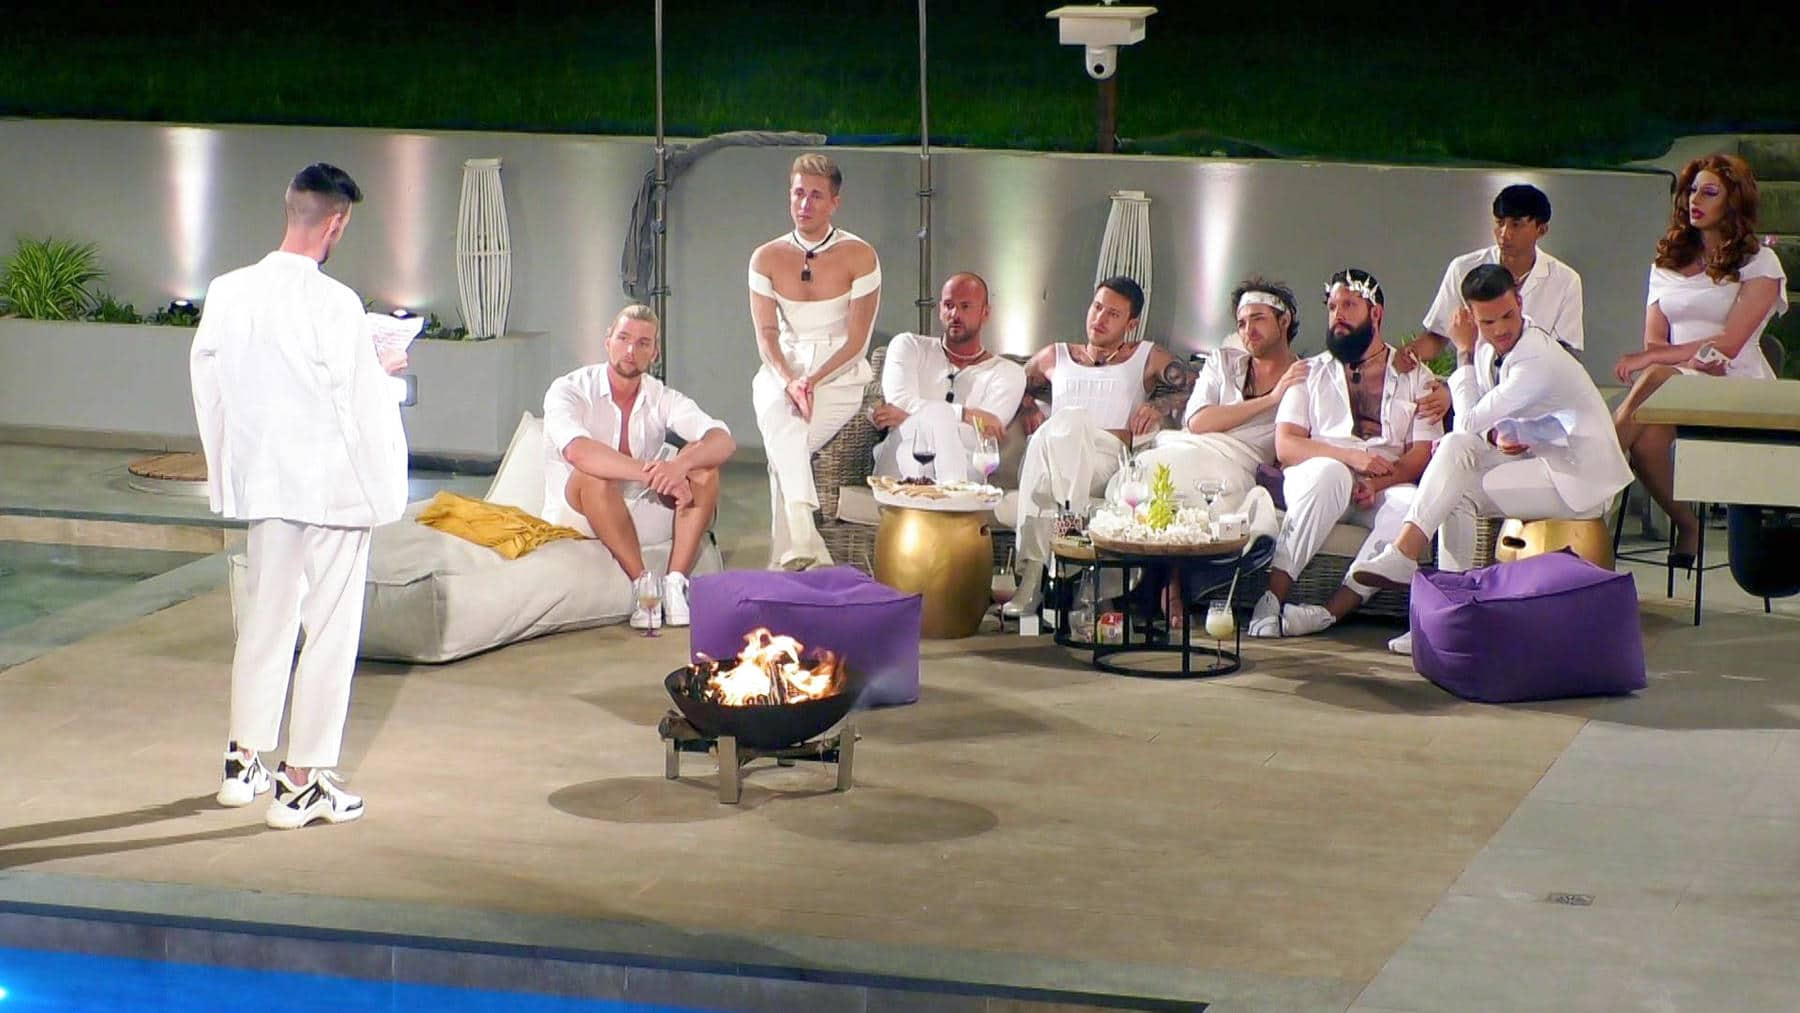 Prince Charming – Staffel 3 – Folge 5